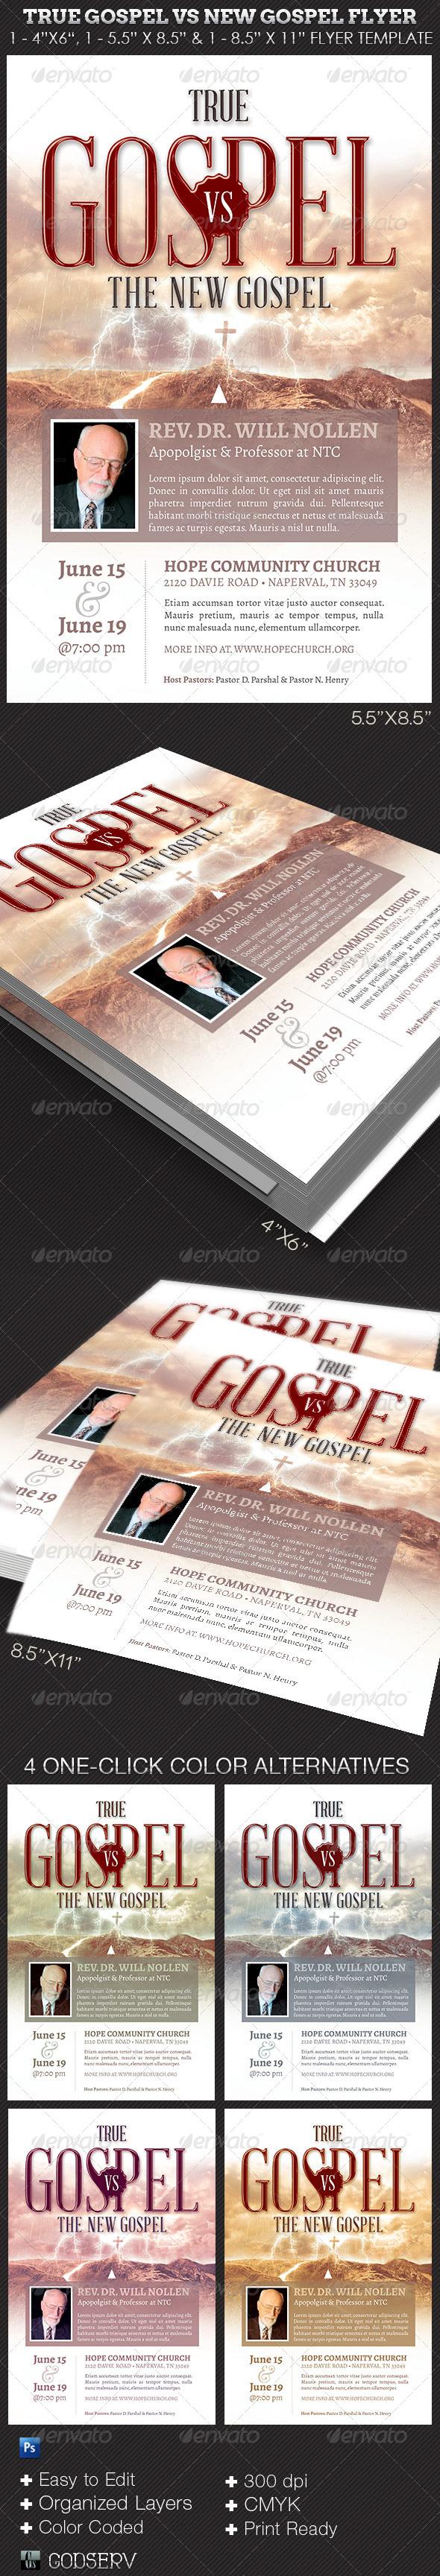 GraphicRiver True Gospel vs New Gospel Church Flyer Template 7767656